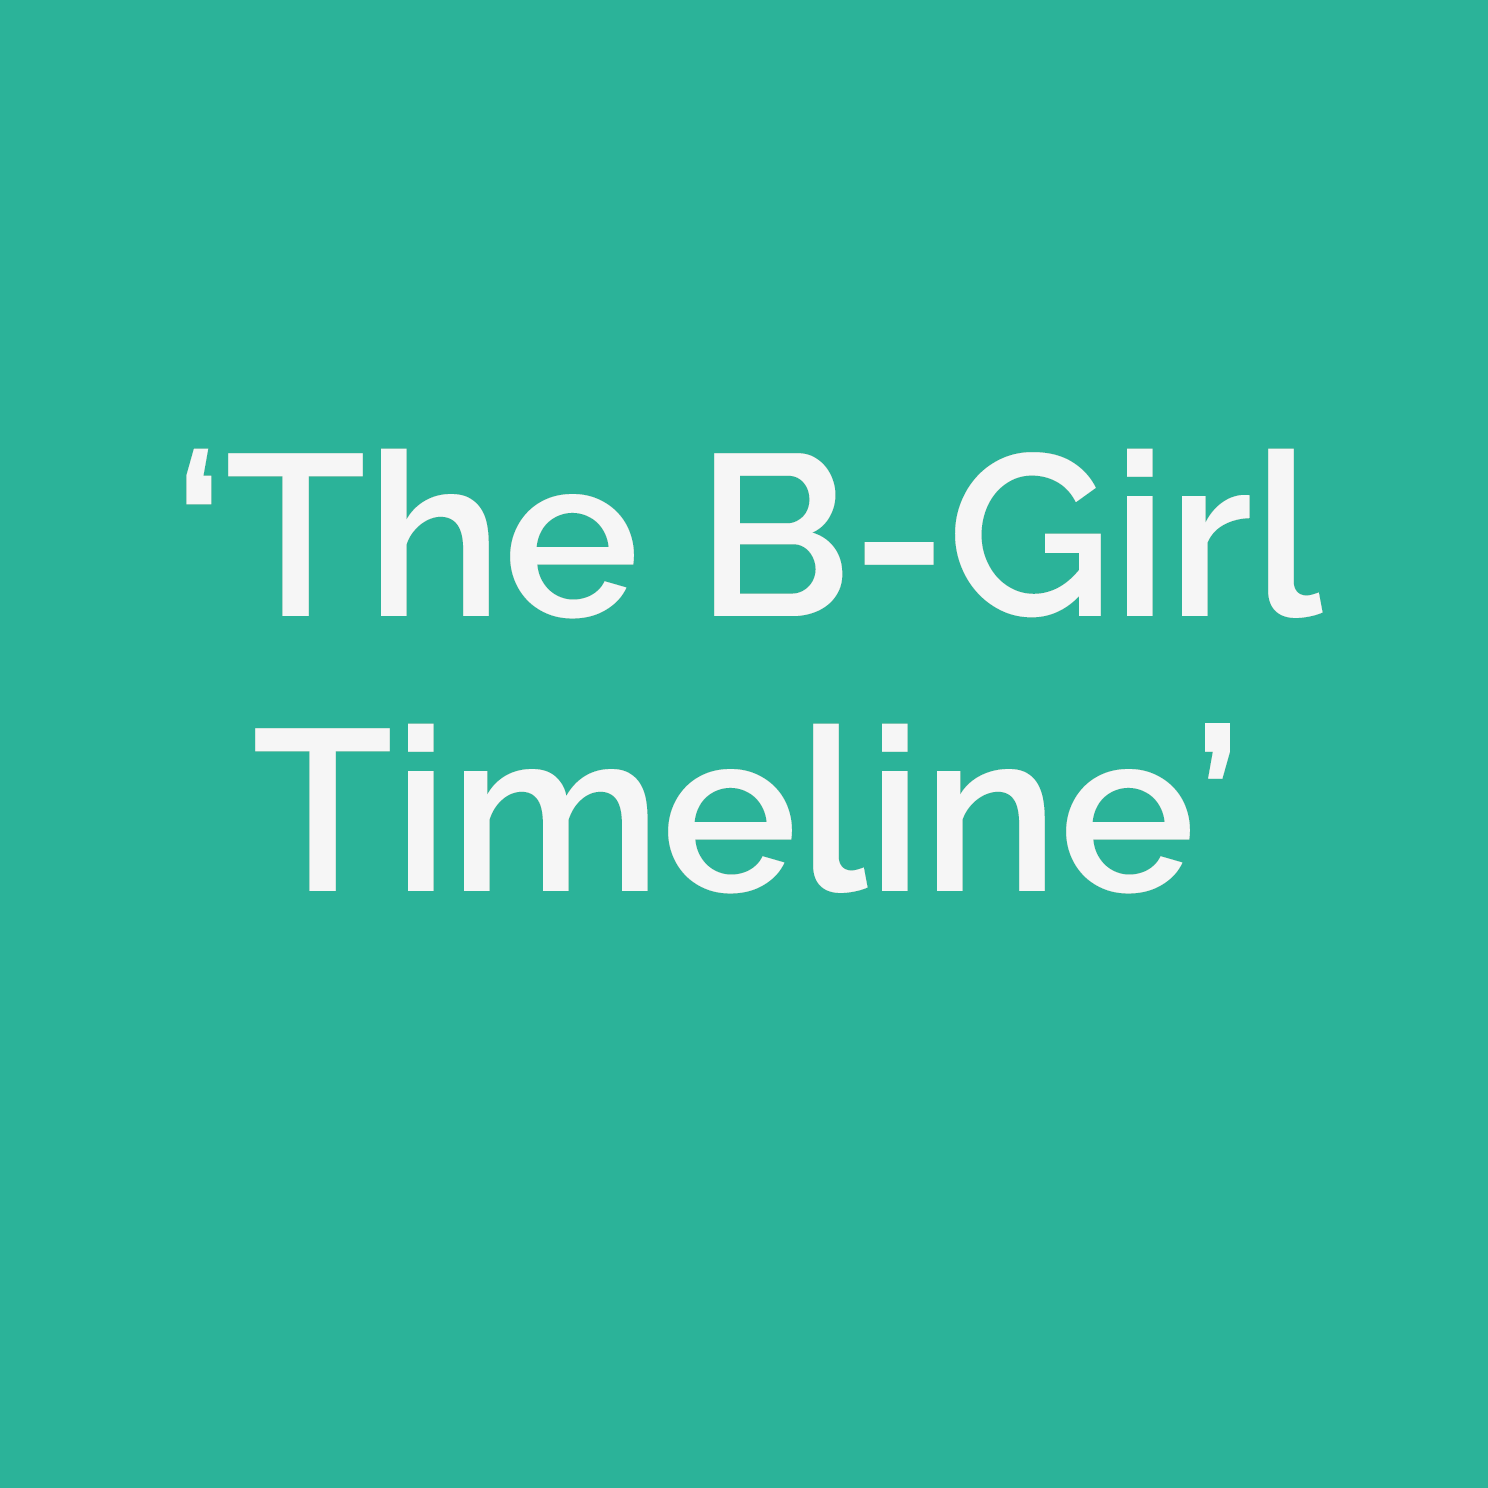 The BGirl Timeline!